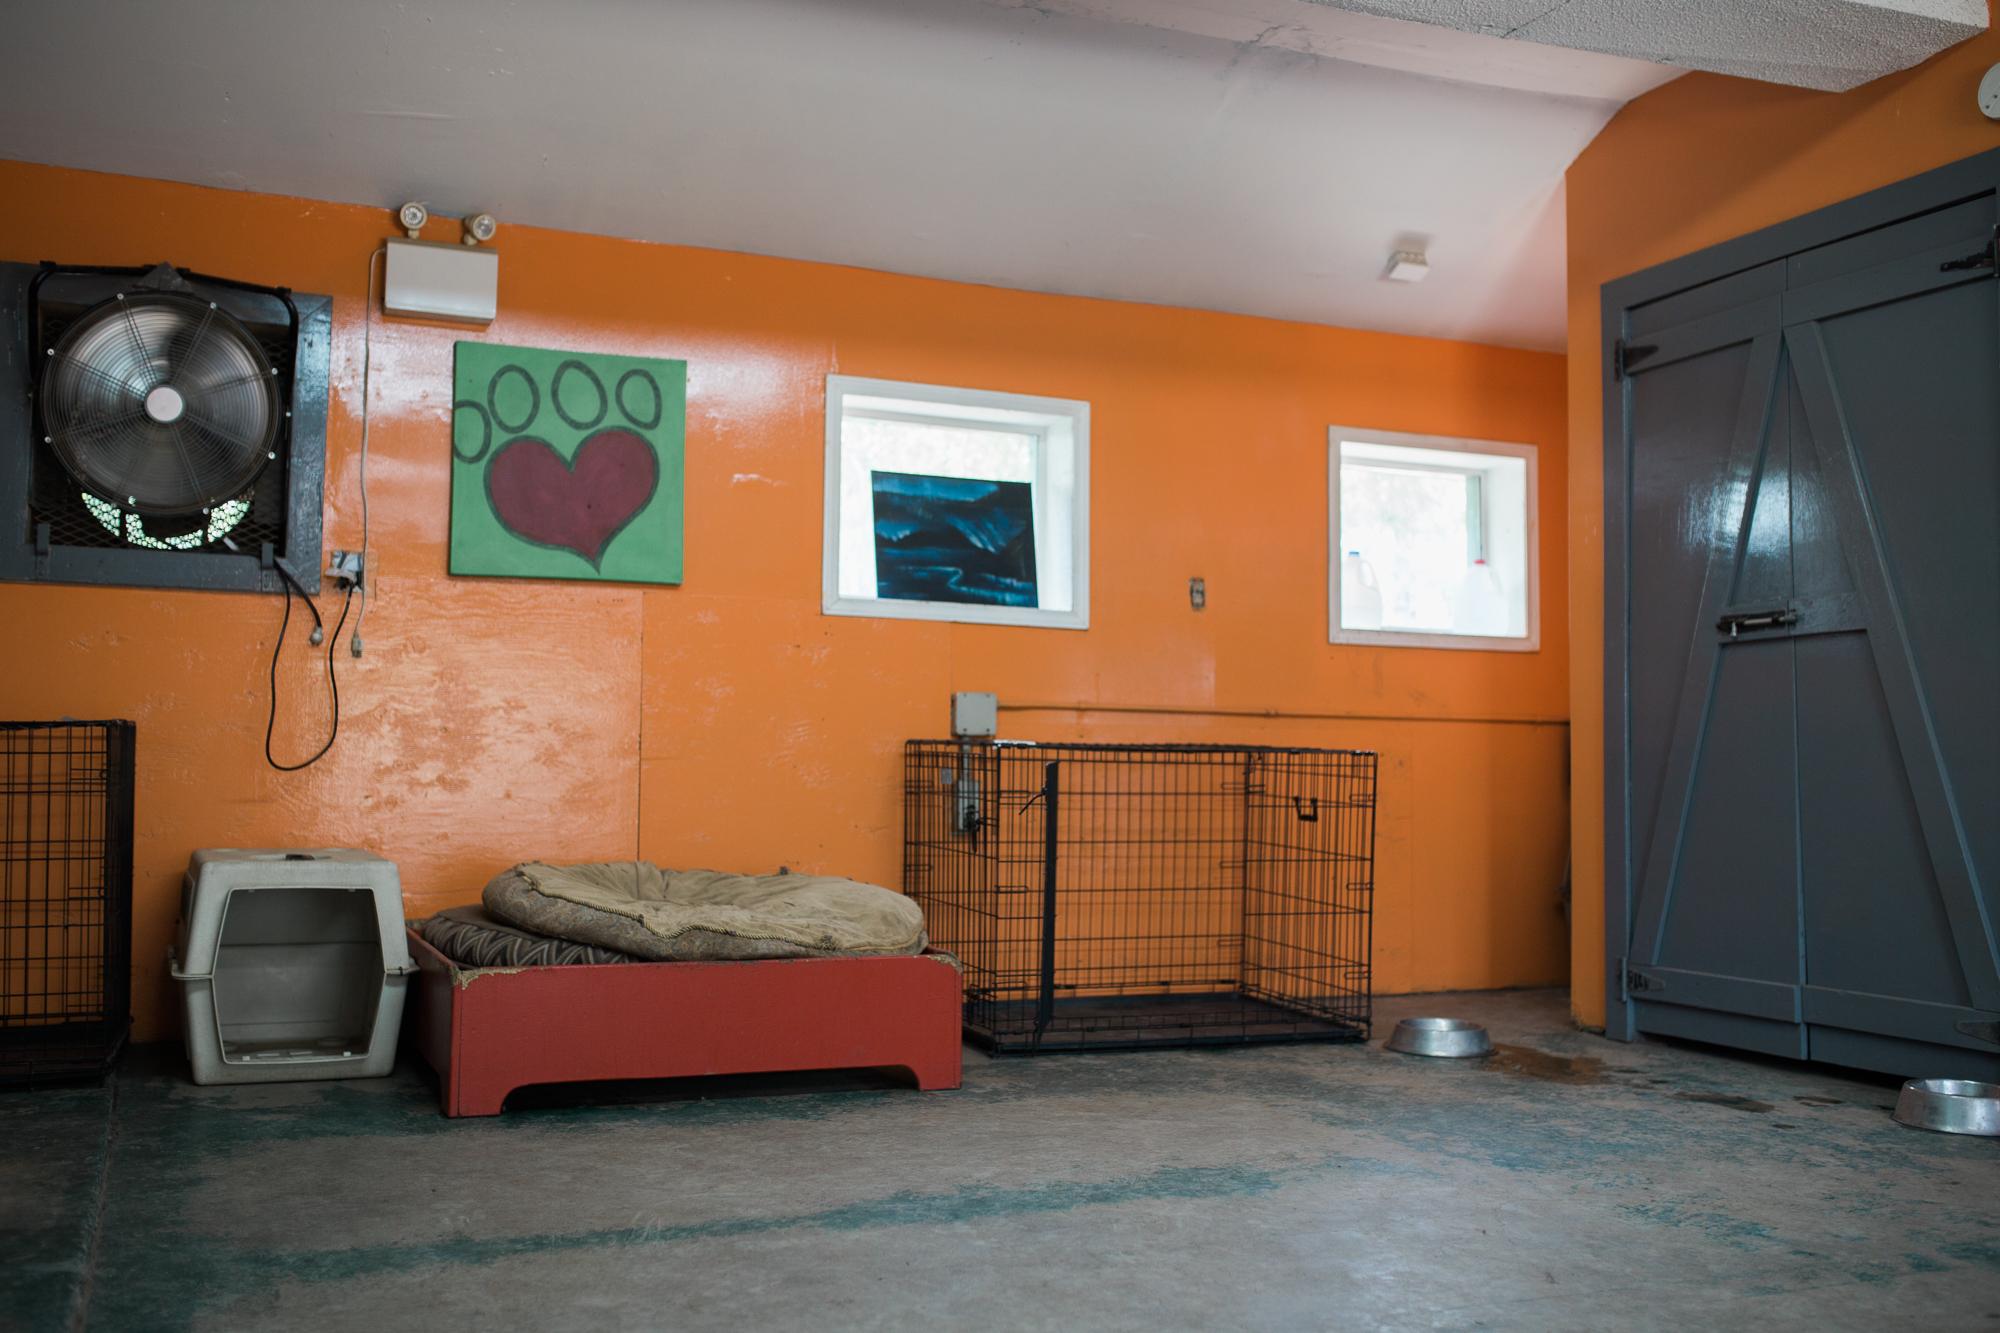 Barking-Good-Facility-2.jpg